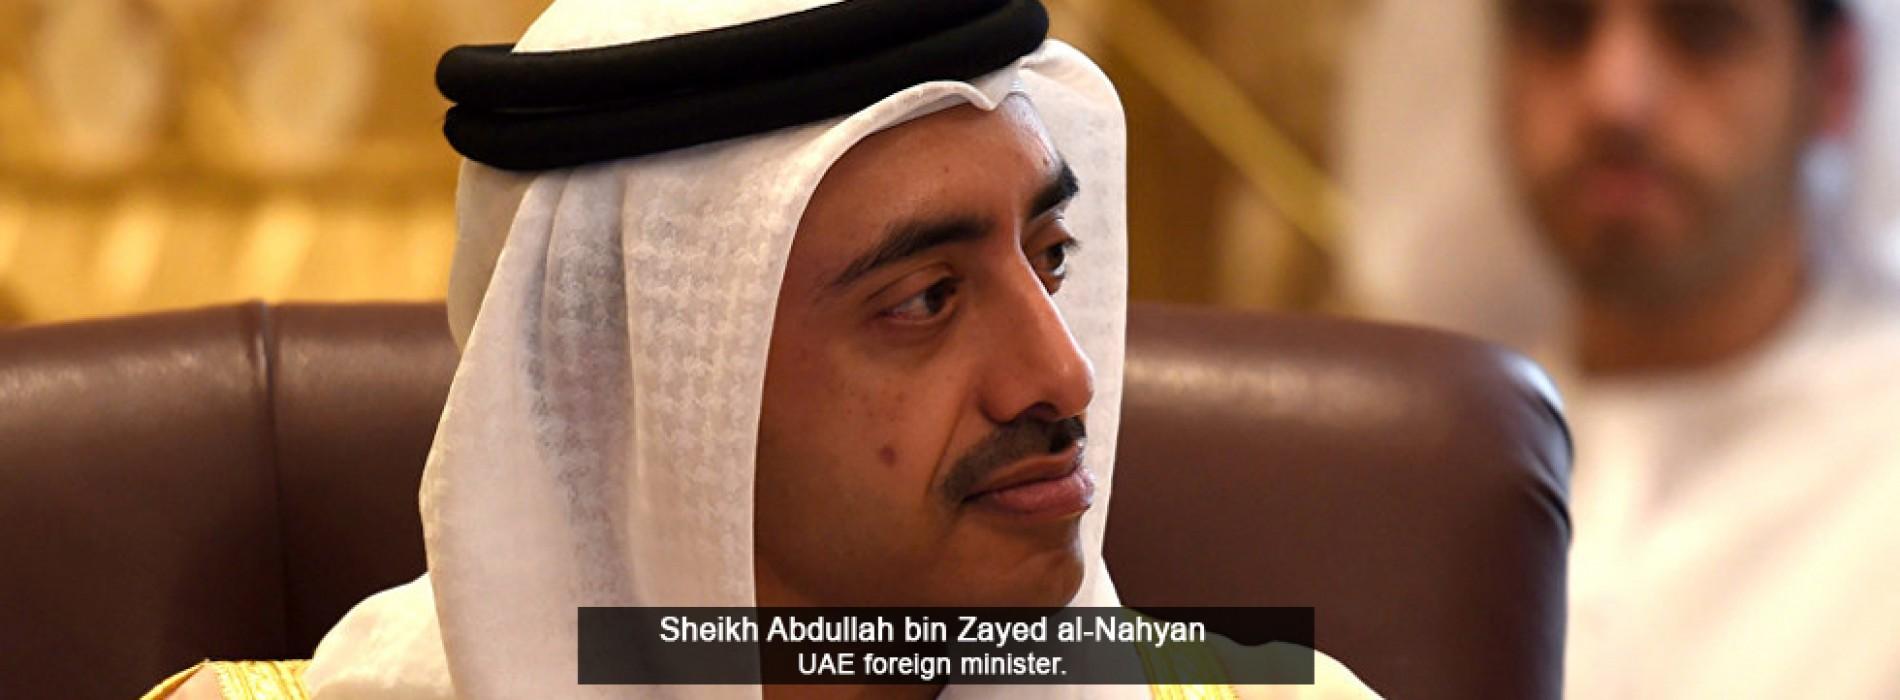 Trump travel ban not anti-Islam, UAE minister says